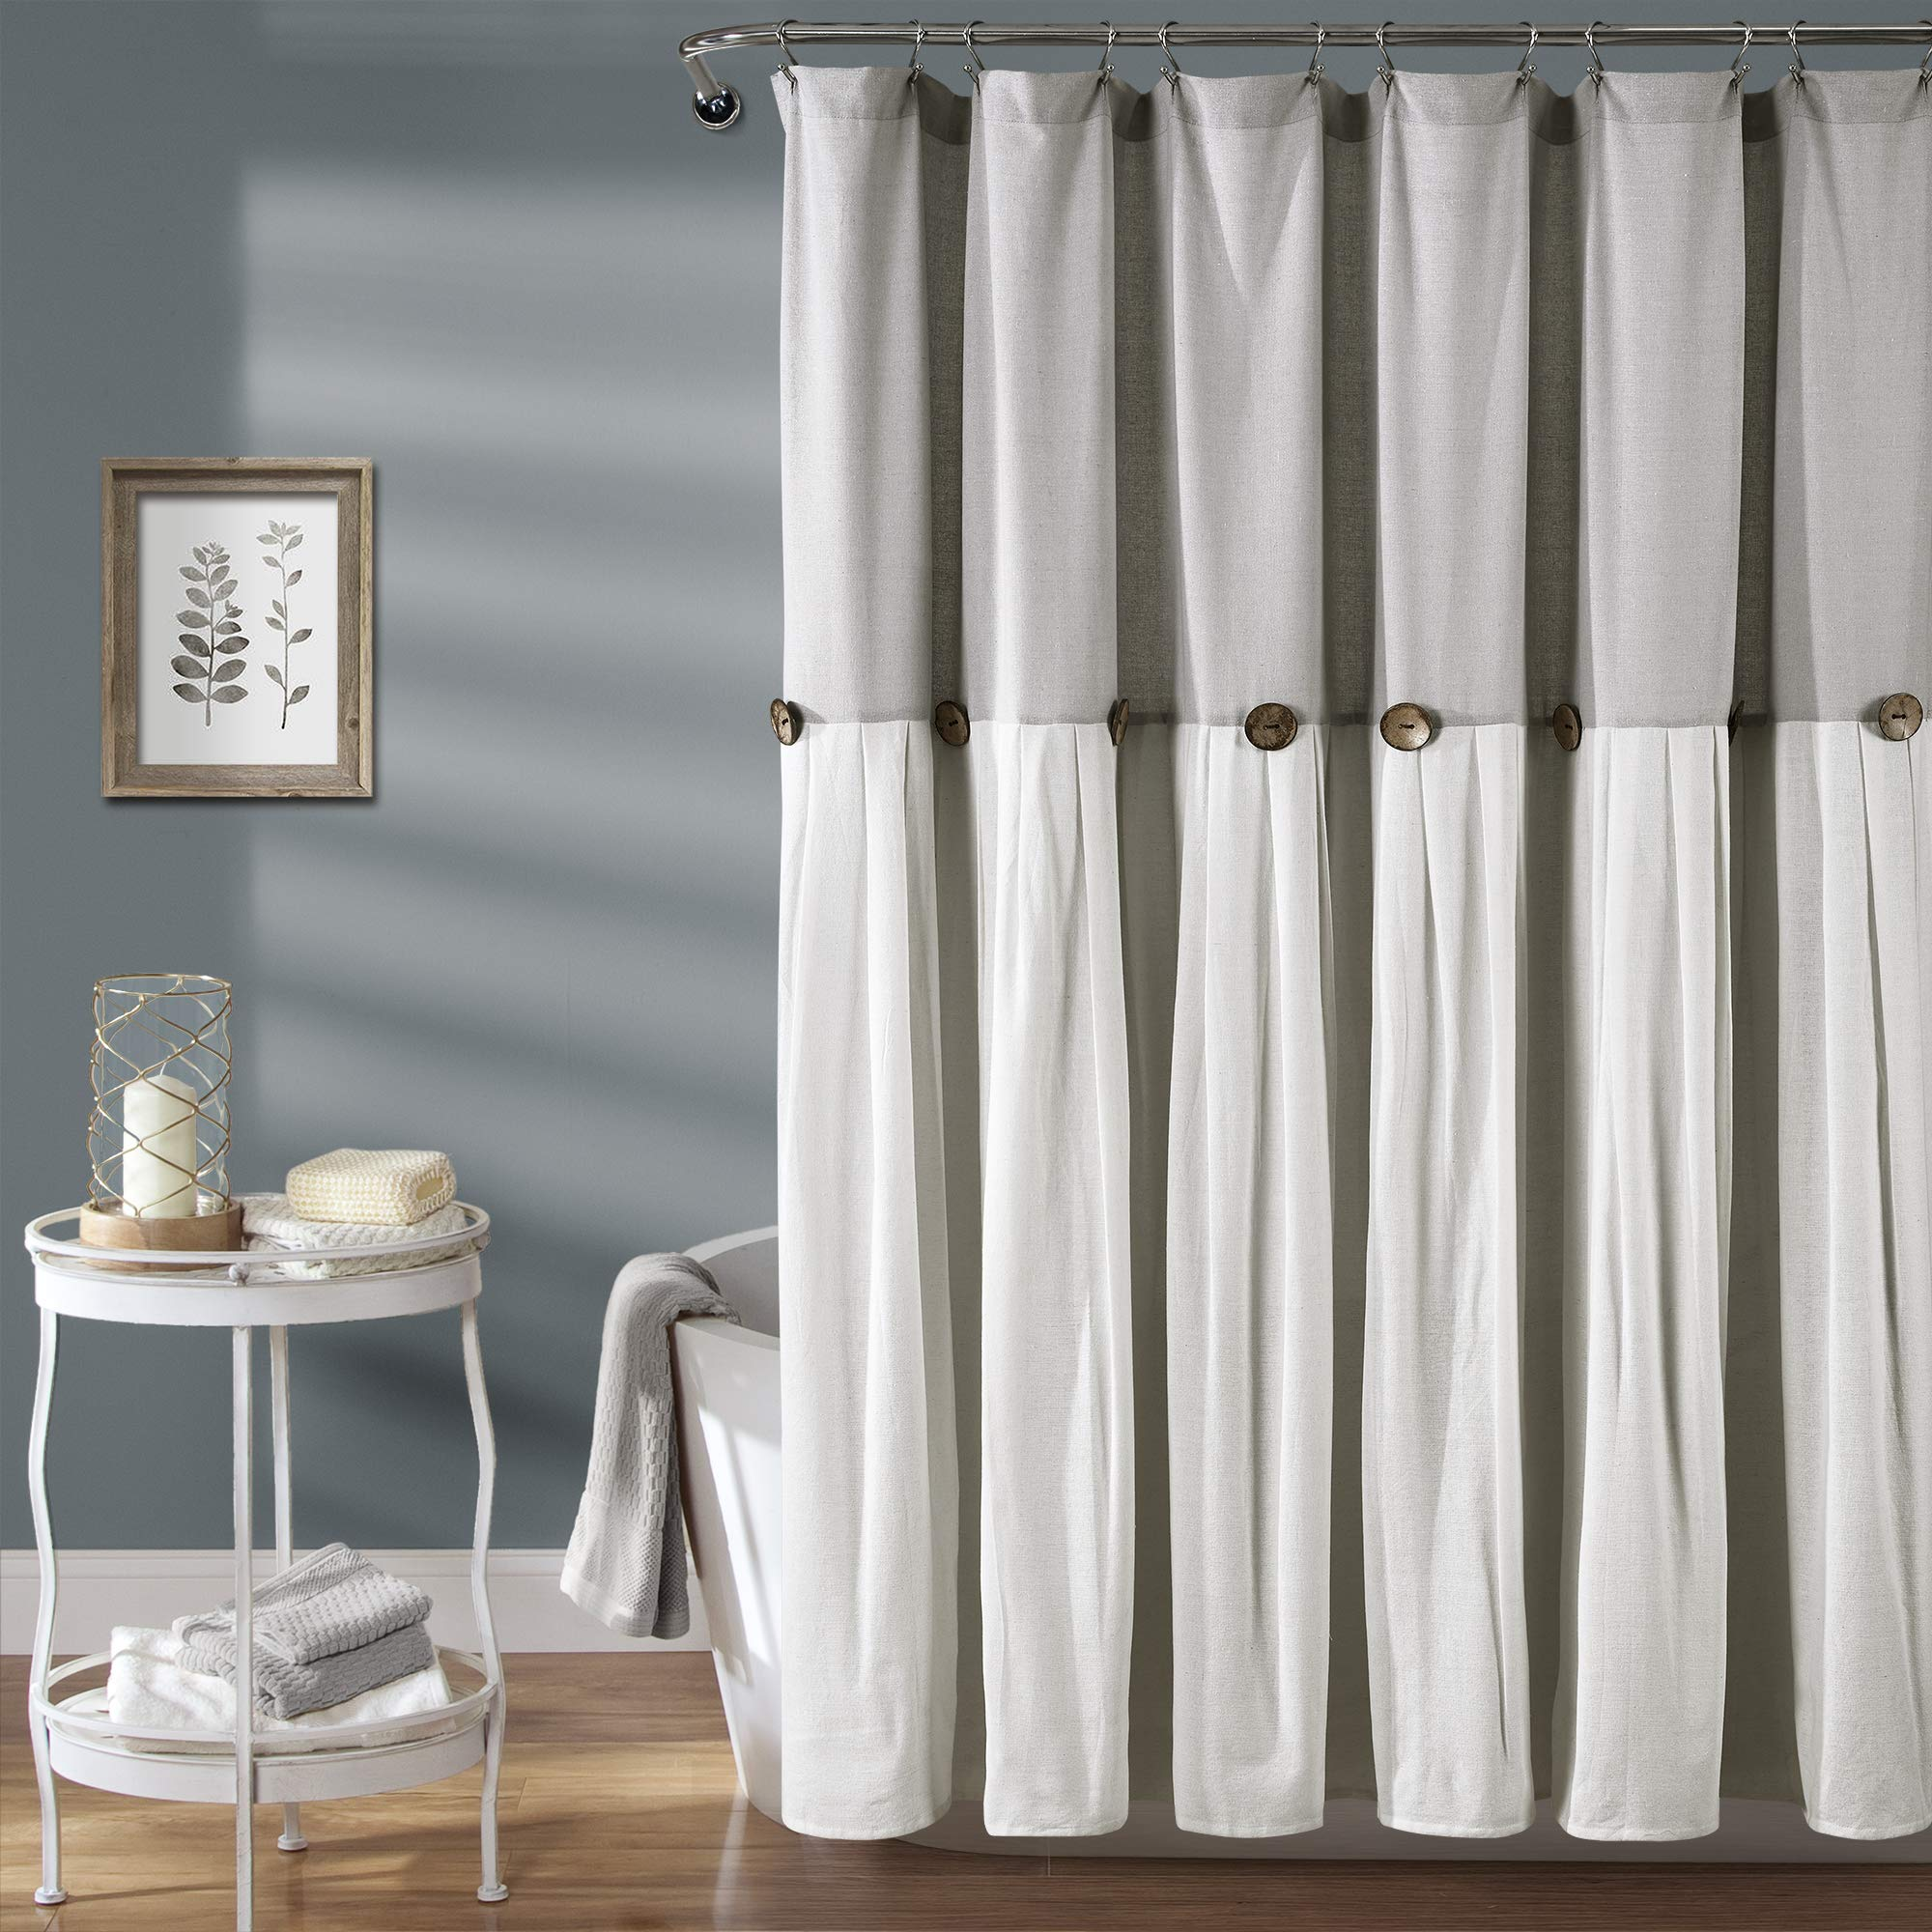 Lush Decor Linen Button Shower Curtain, 72'' x 72'', Gray & White